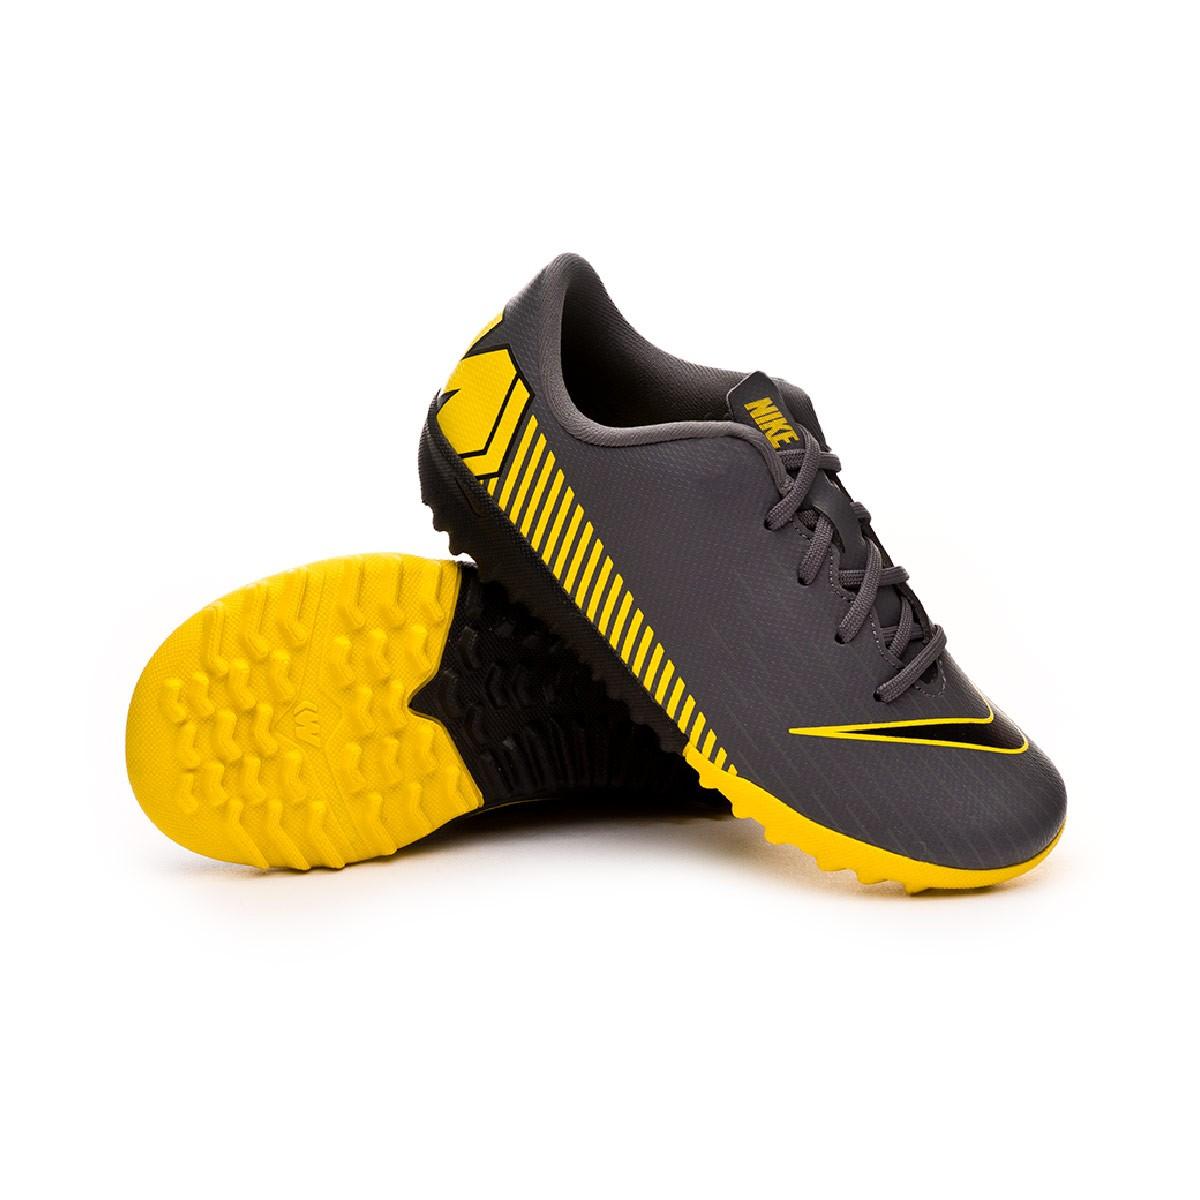 b20c8ea53a92 Football Boot Nike Kids Mercurial VaporX XII Academy Turf Dark grey-Black-Optical  yellow - Football store Fútbol Emotion